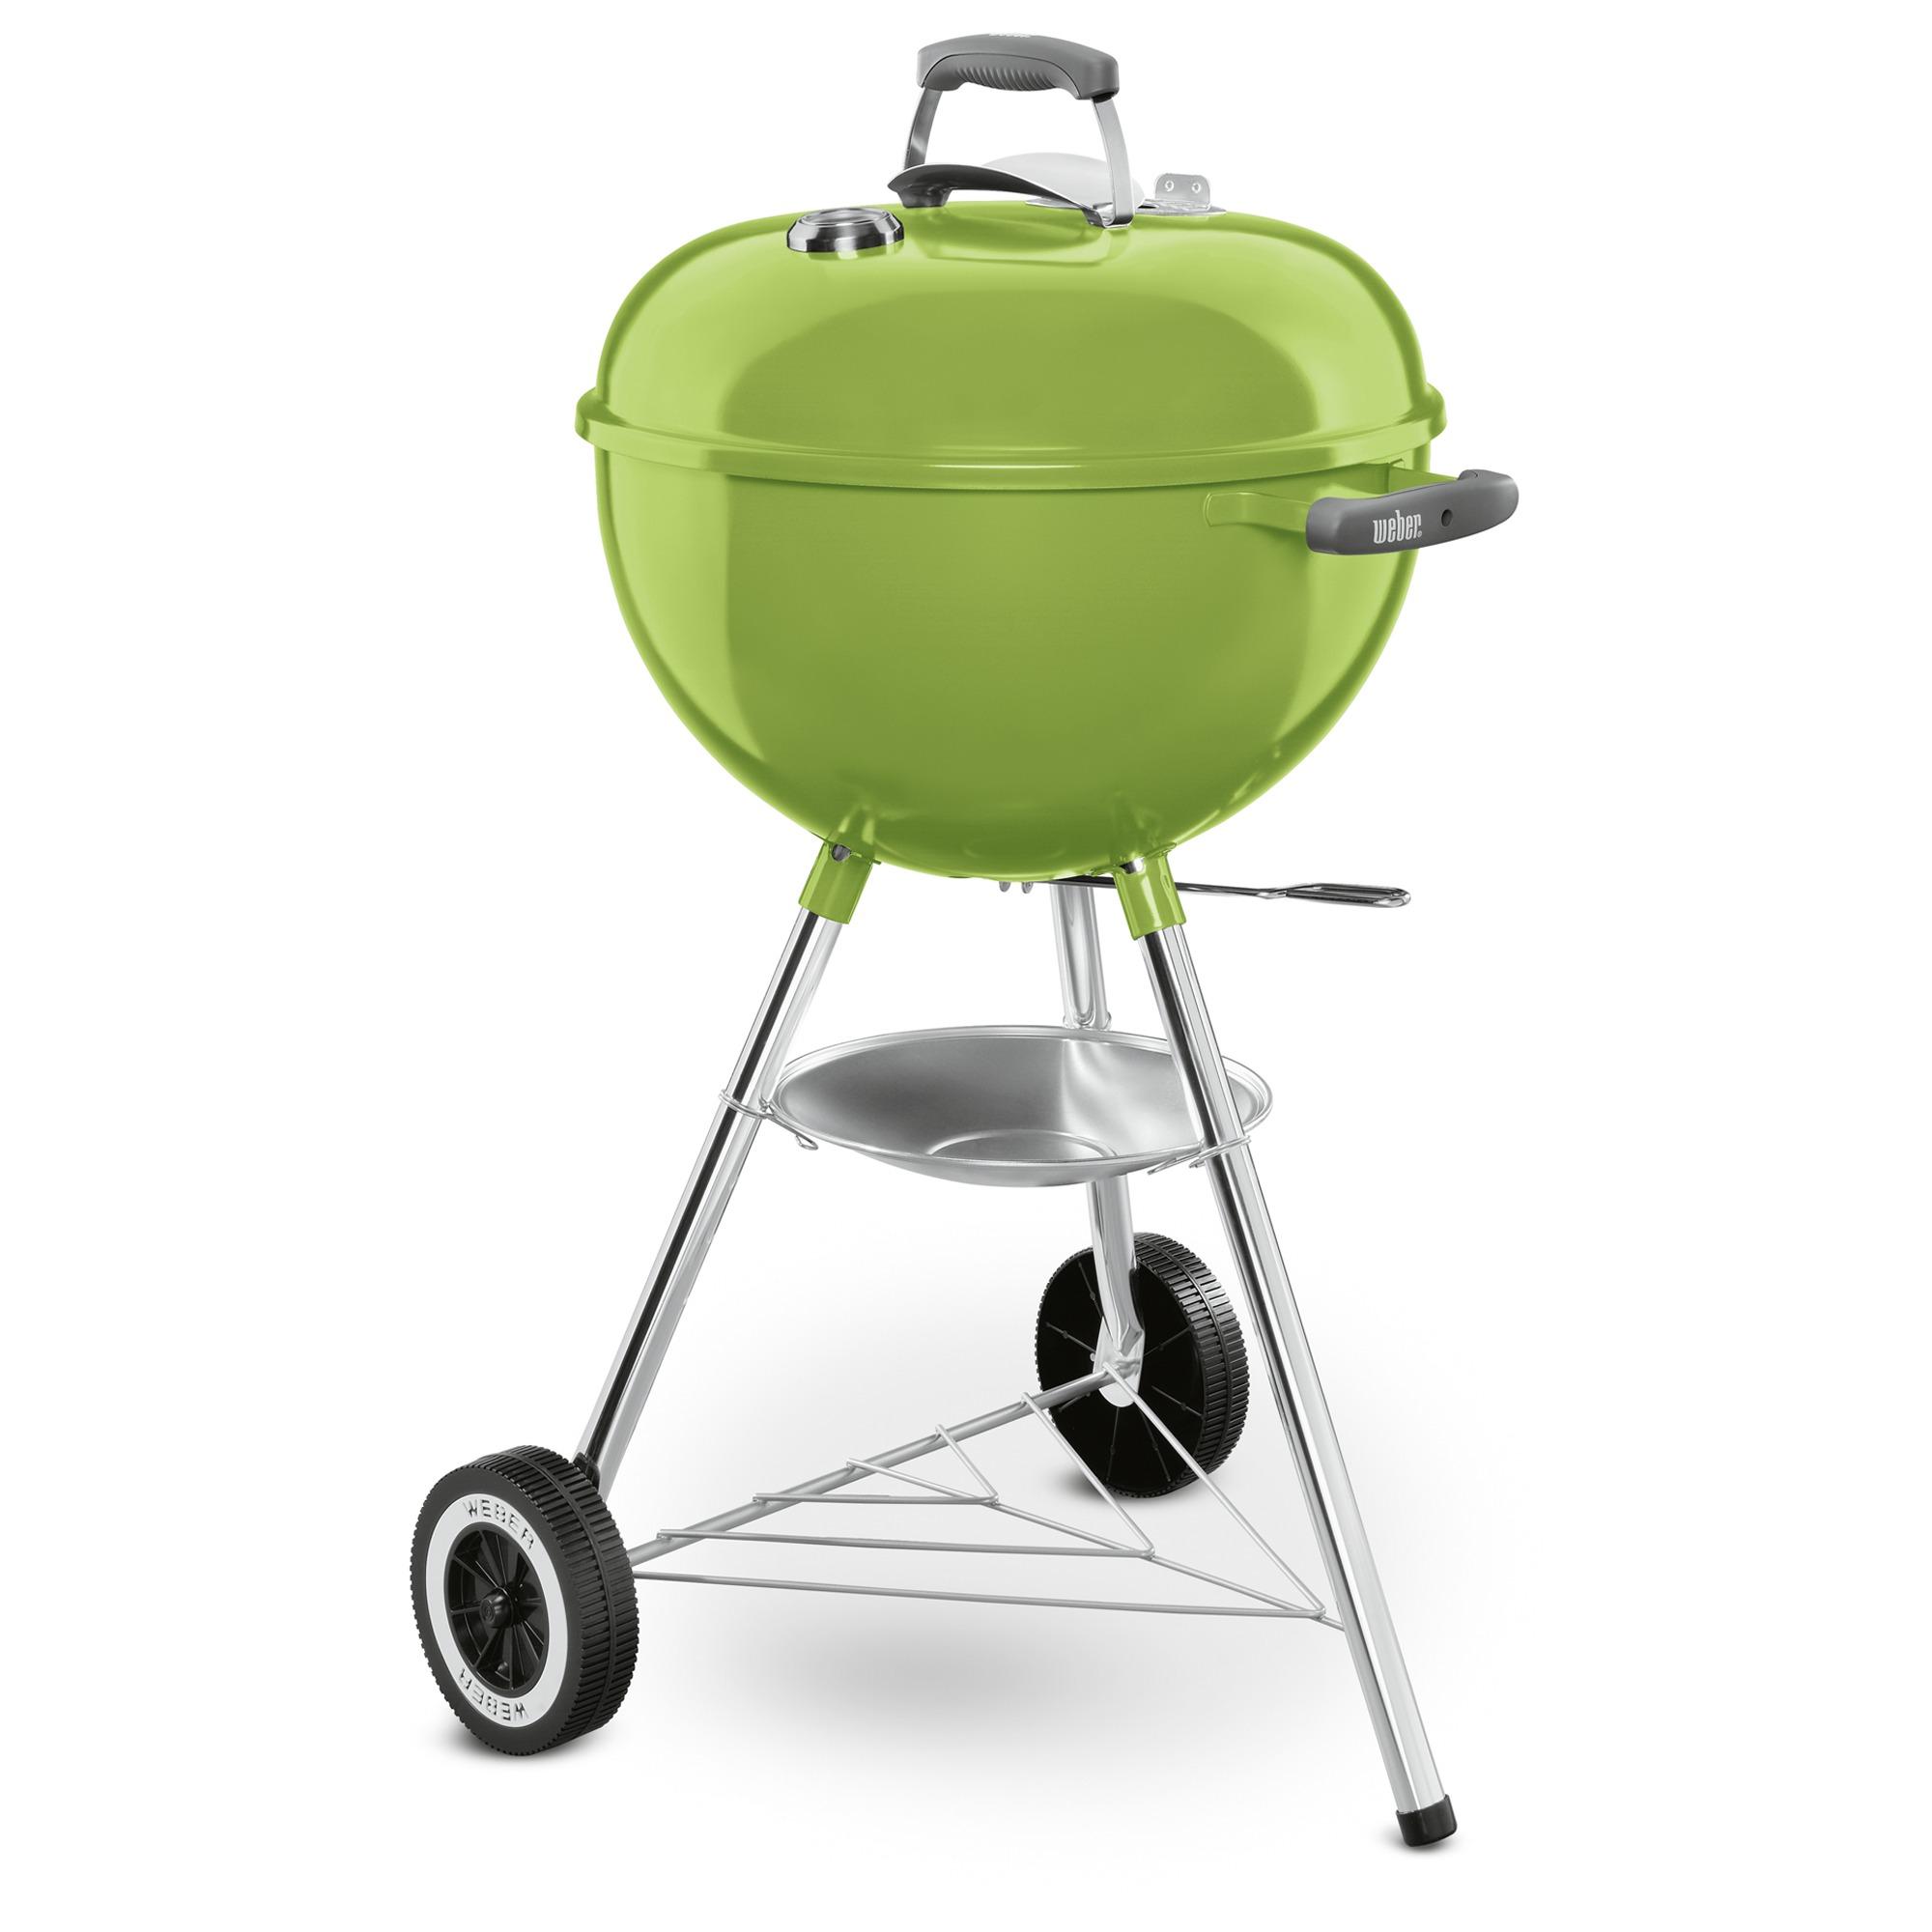 Weber barbecue original kettle metaal groen o 47 cm